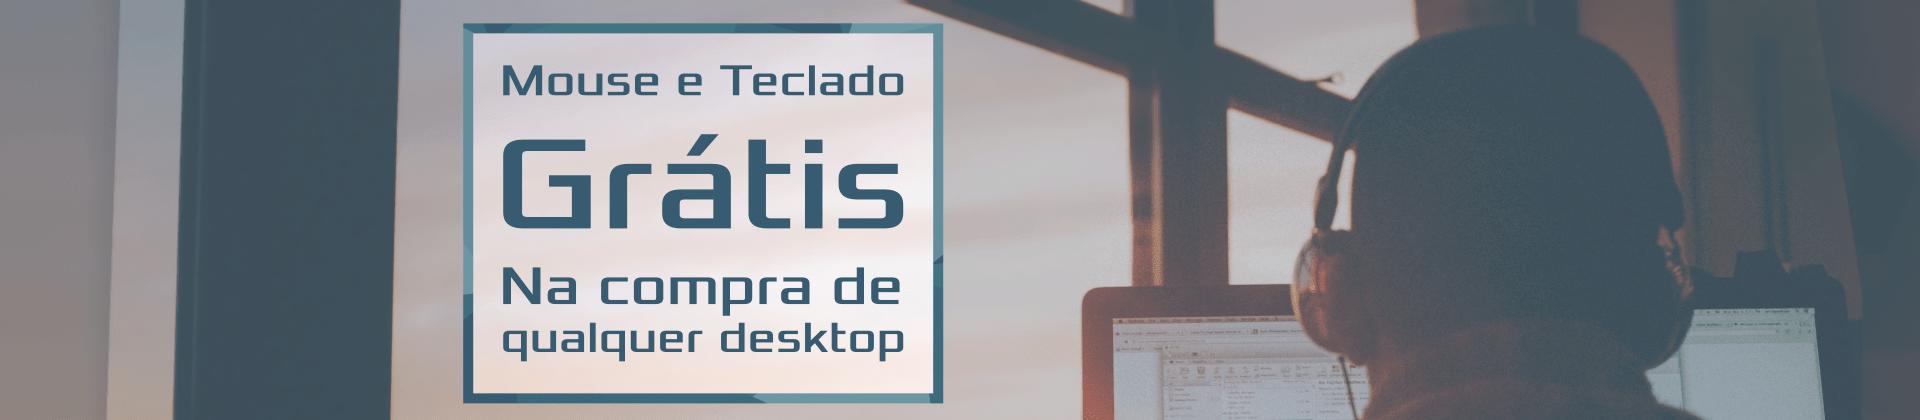 tecl+mouse gratis